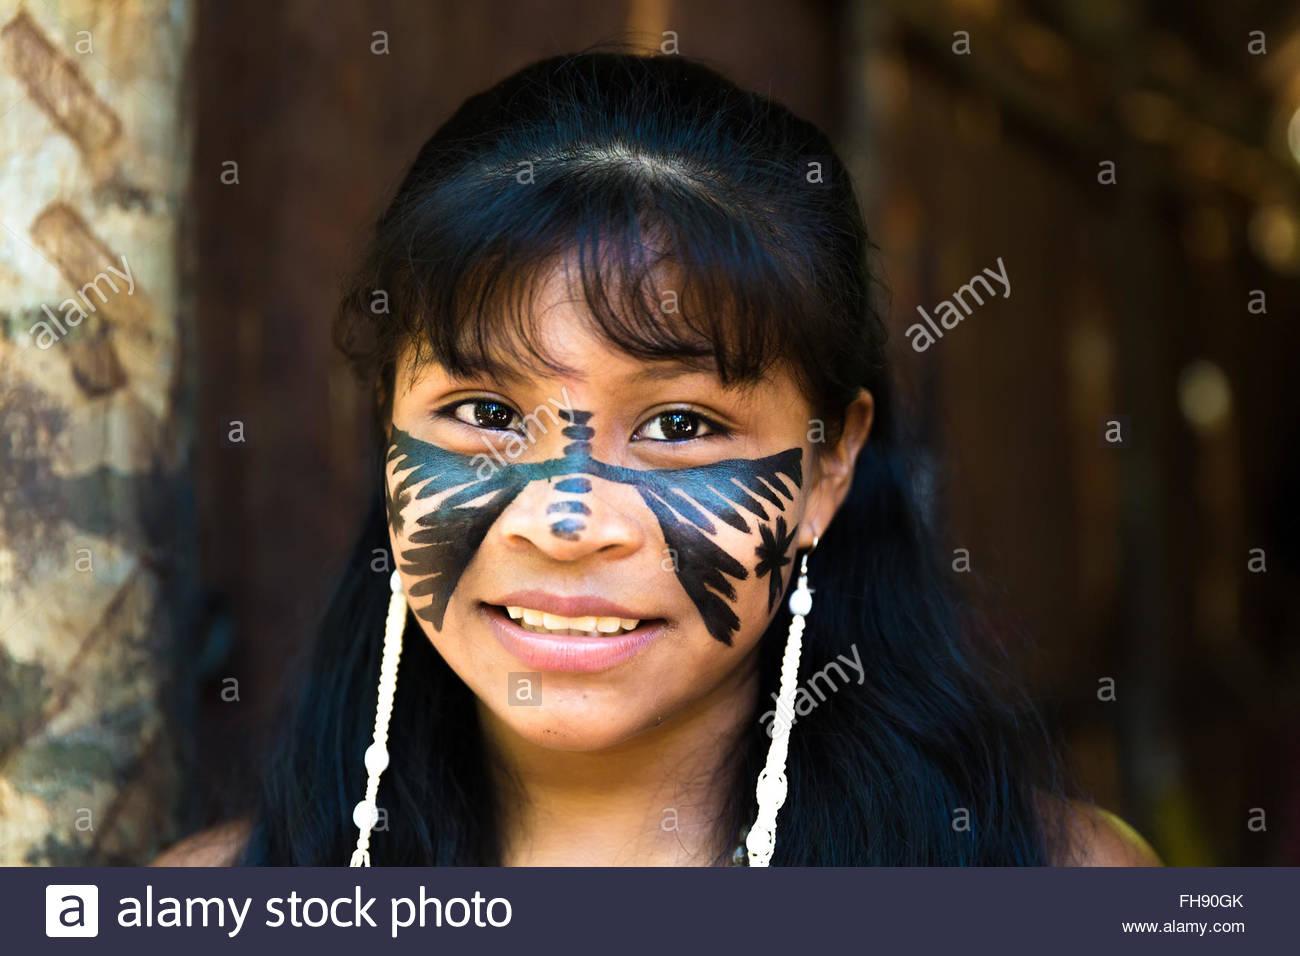 brazilian cute indian girl in amazon, brazil stock photo: 96699027